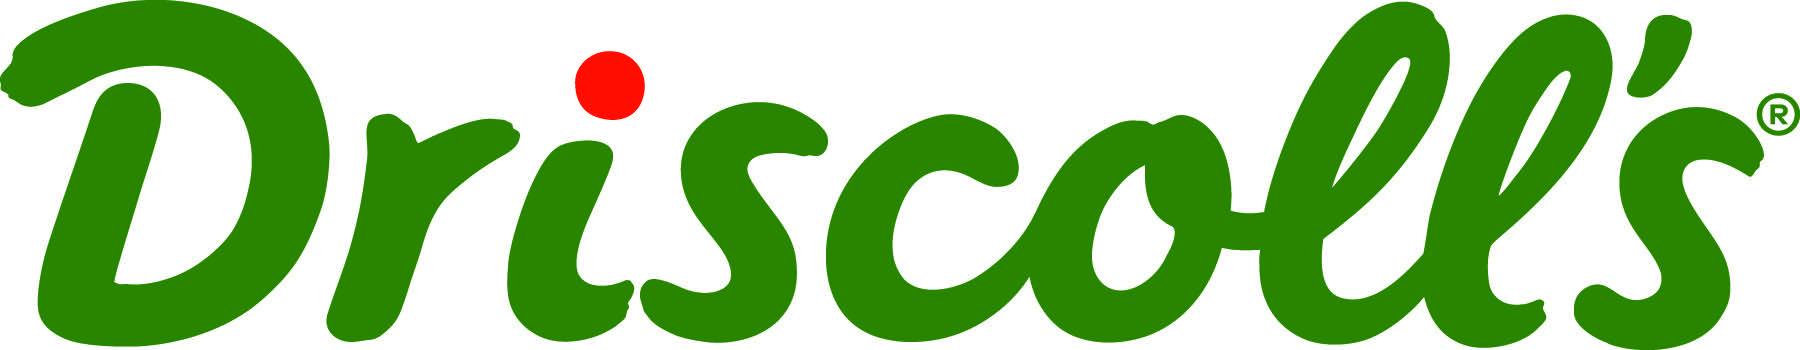 Driscolls_New_Logo_red_w_cmyk-c_sm_copy.jpg